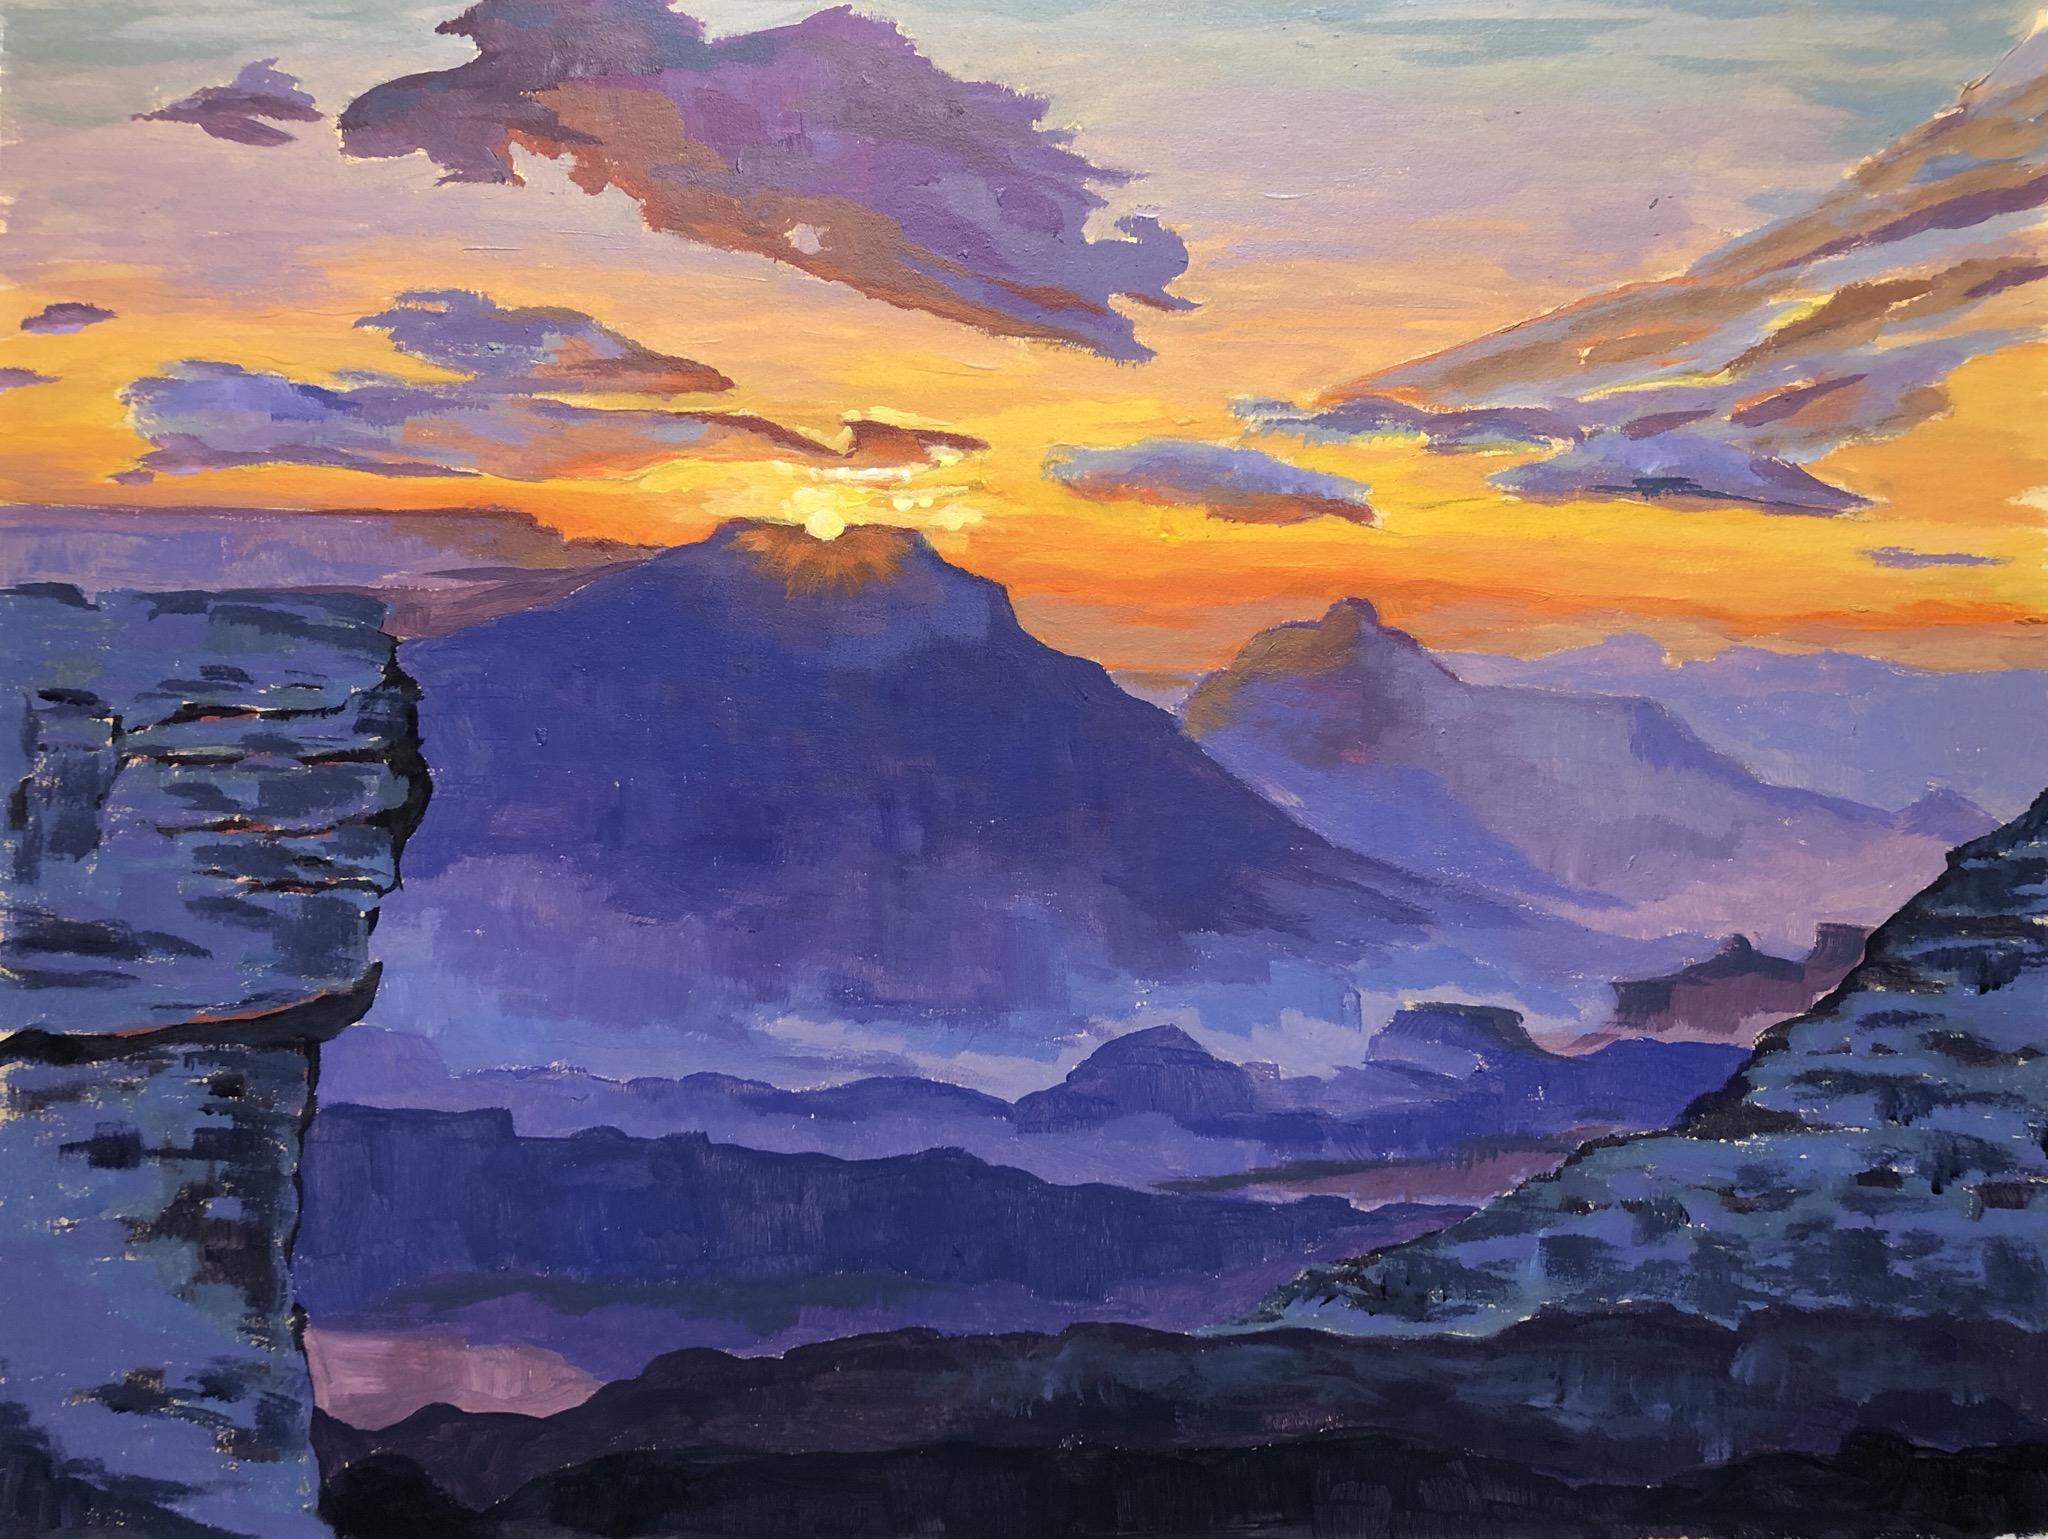 Sunrise, 5:42am Mather Point - Grand Canyon National Park